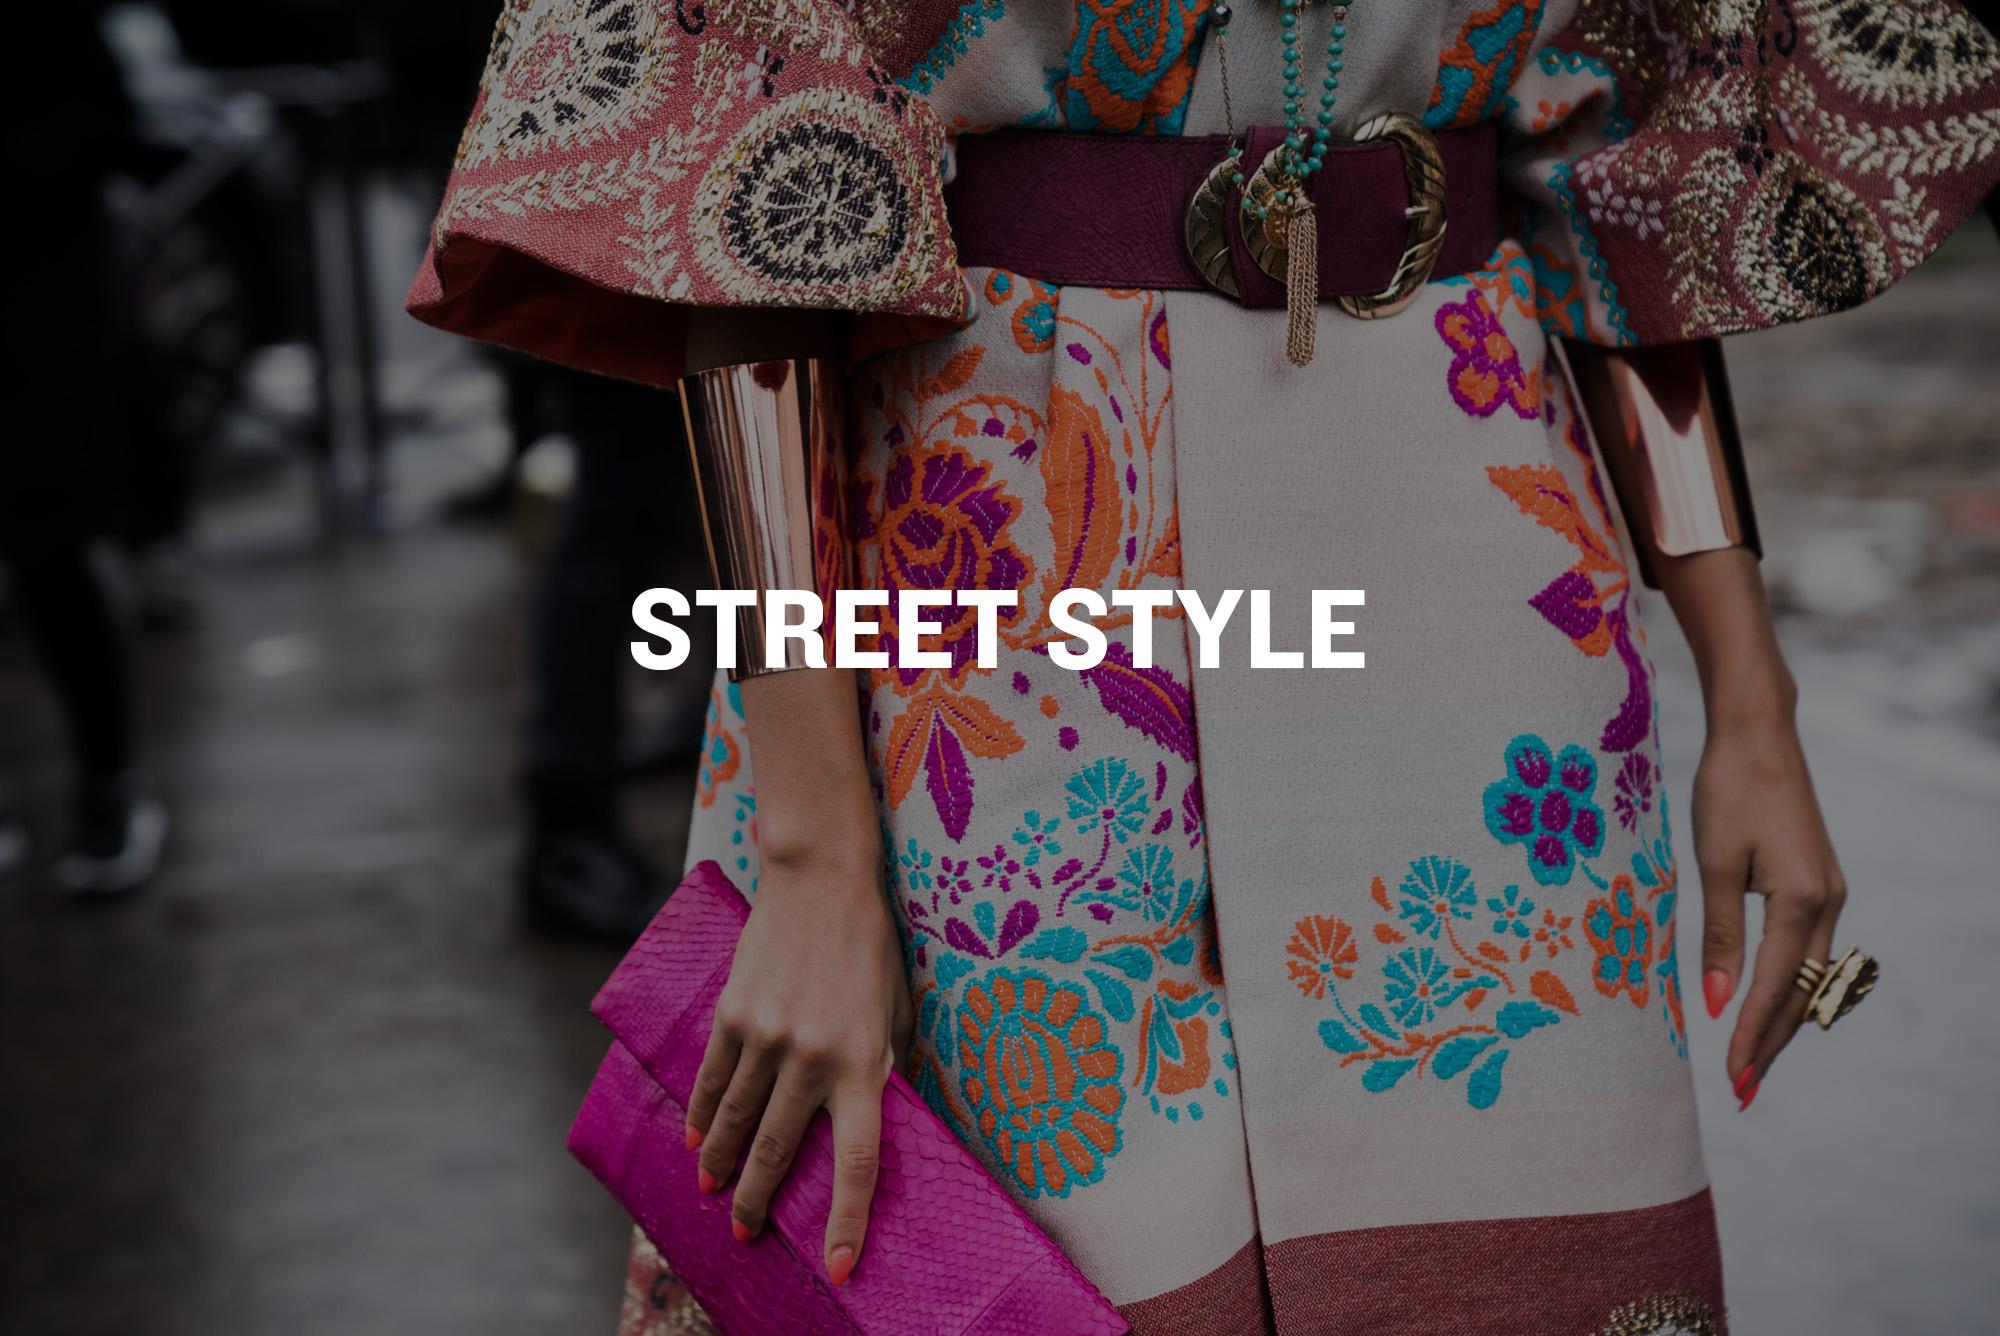 StreetStyleGallery.jpg